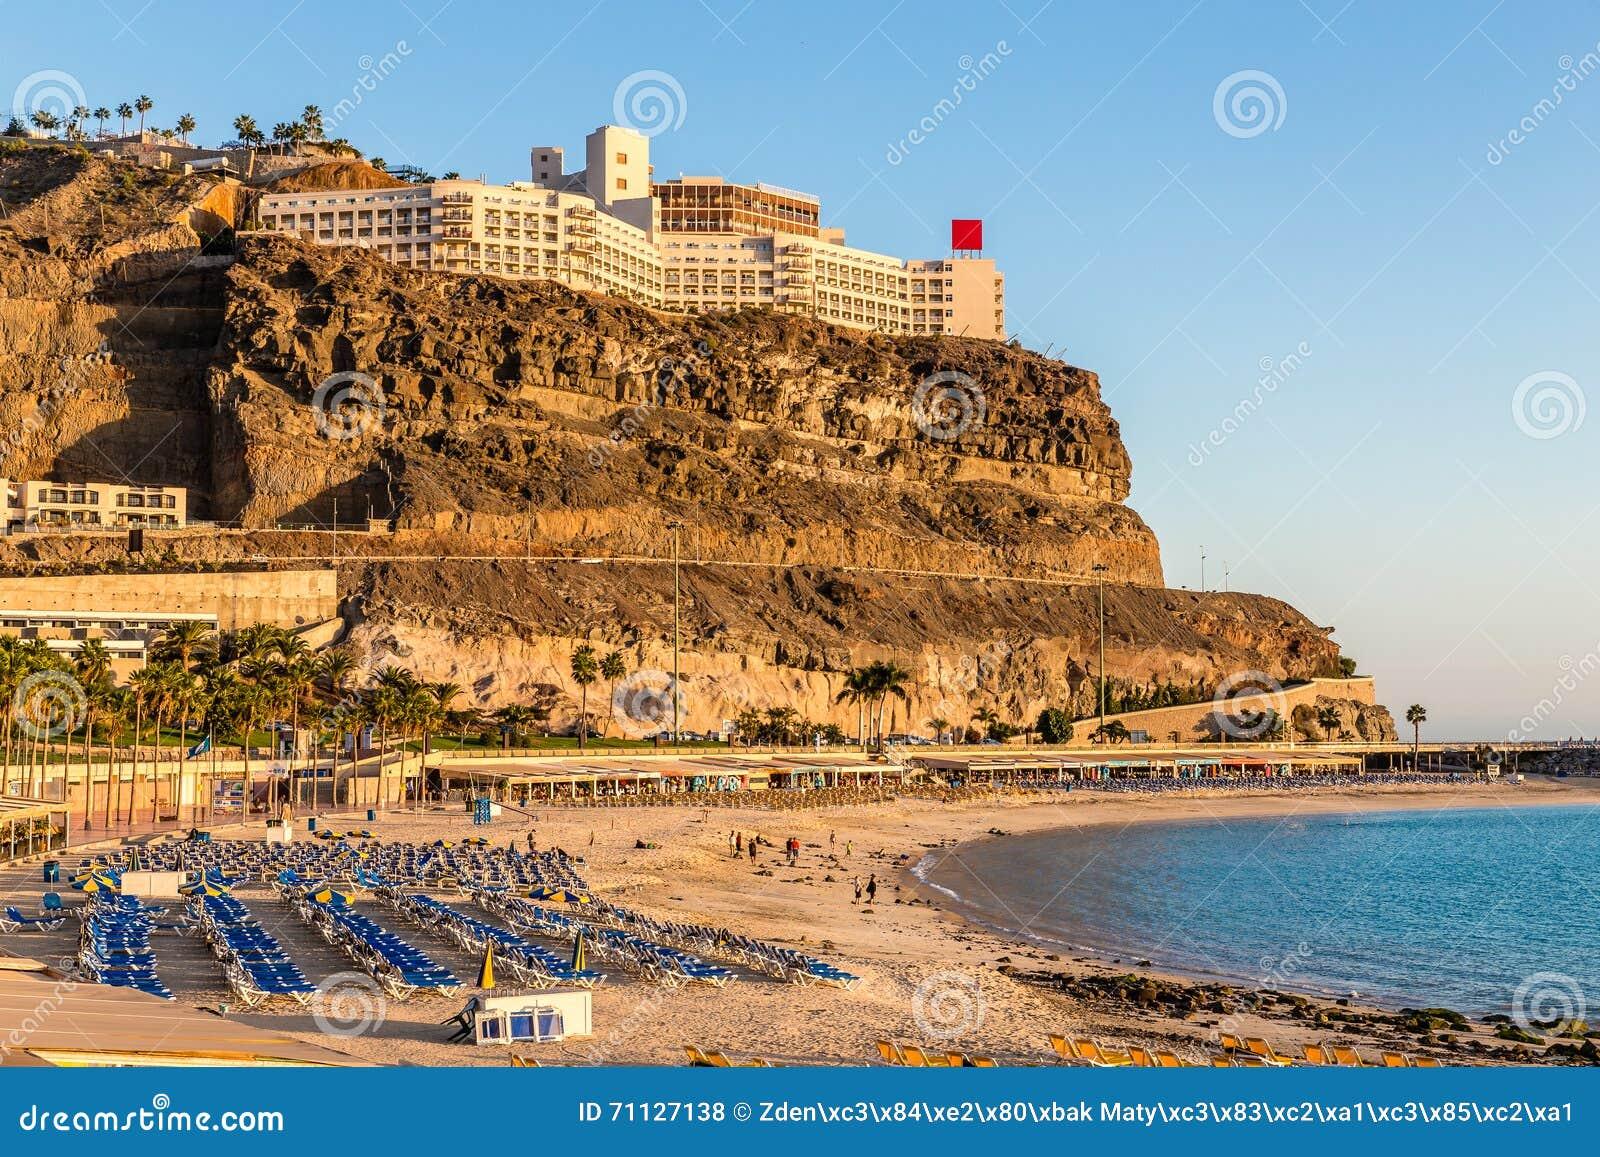 amadores strand puerto rico gran canaria spanien stockfoto bild 71127138. Black Bedroom Furniture Sets. Home Design Ideas